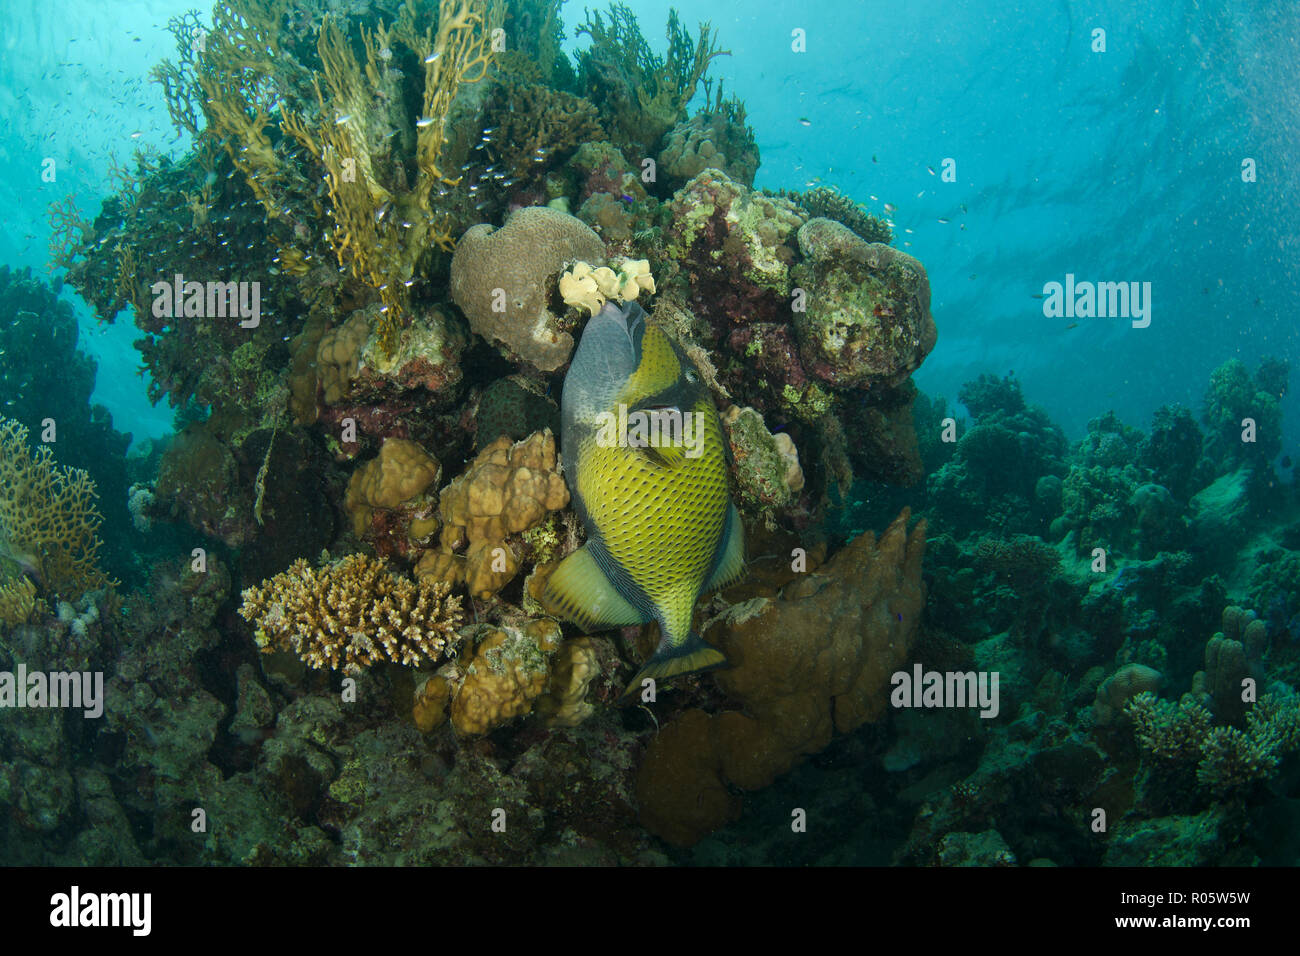 Titan triggerfish, Balistoides viridescens, holding onto sponge on coral reef, Hamata, Red Sea, Egypt - Stock Image